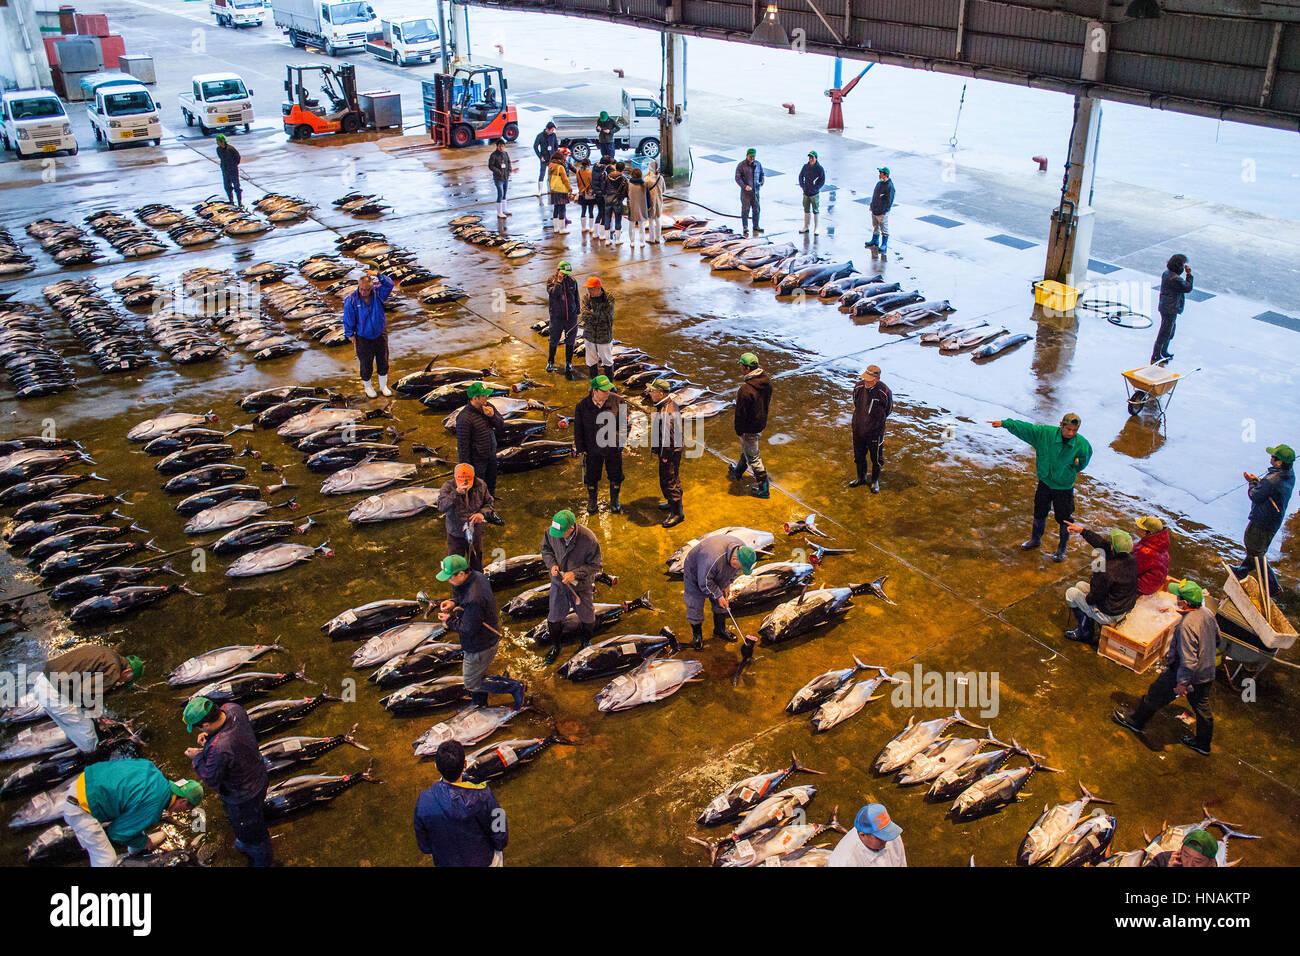 Tuna Market, in fishing port, Katsuura, Nachikatsuura, Nakahechi route, Wakayama, Kinki, Japan. - Stock Image